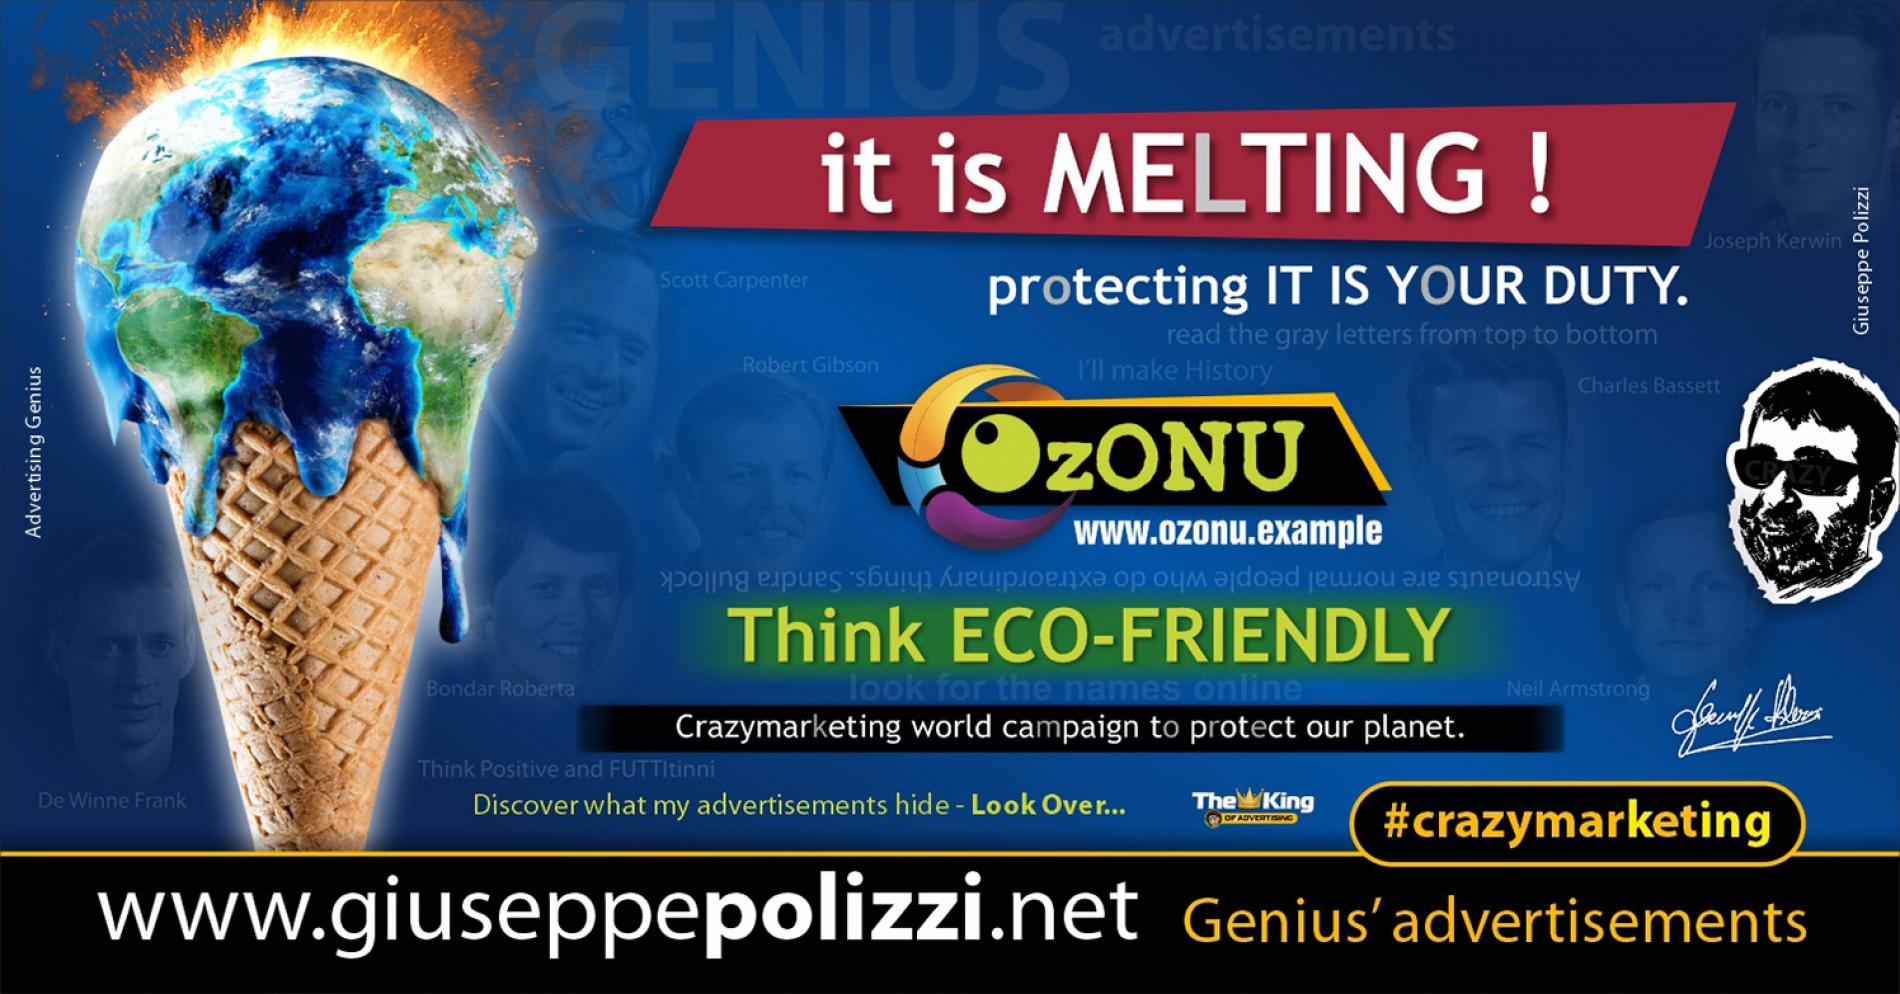 Giuseppe Polizzi Crazymarketing  Think ECO FRIENDLY advertisements